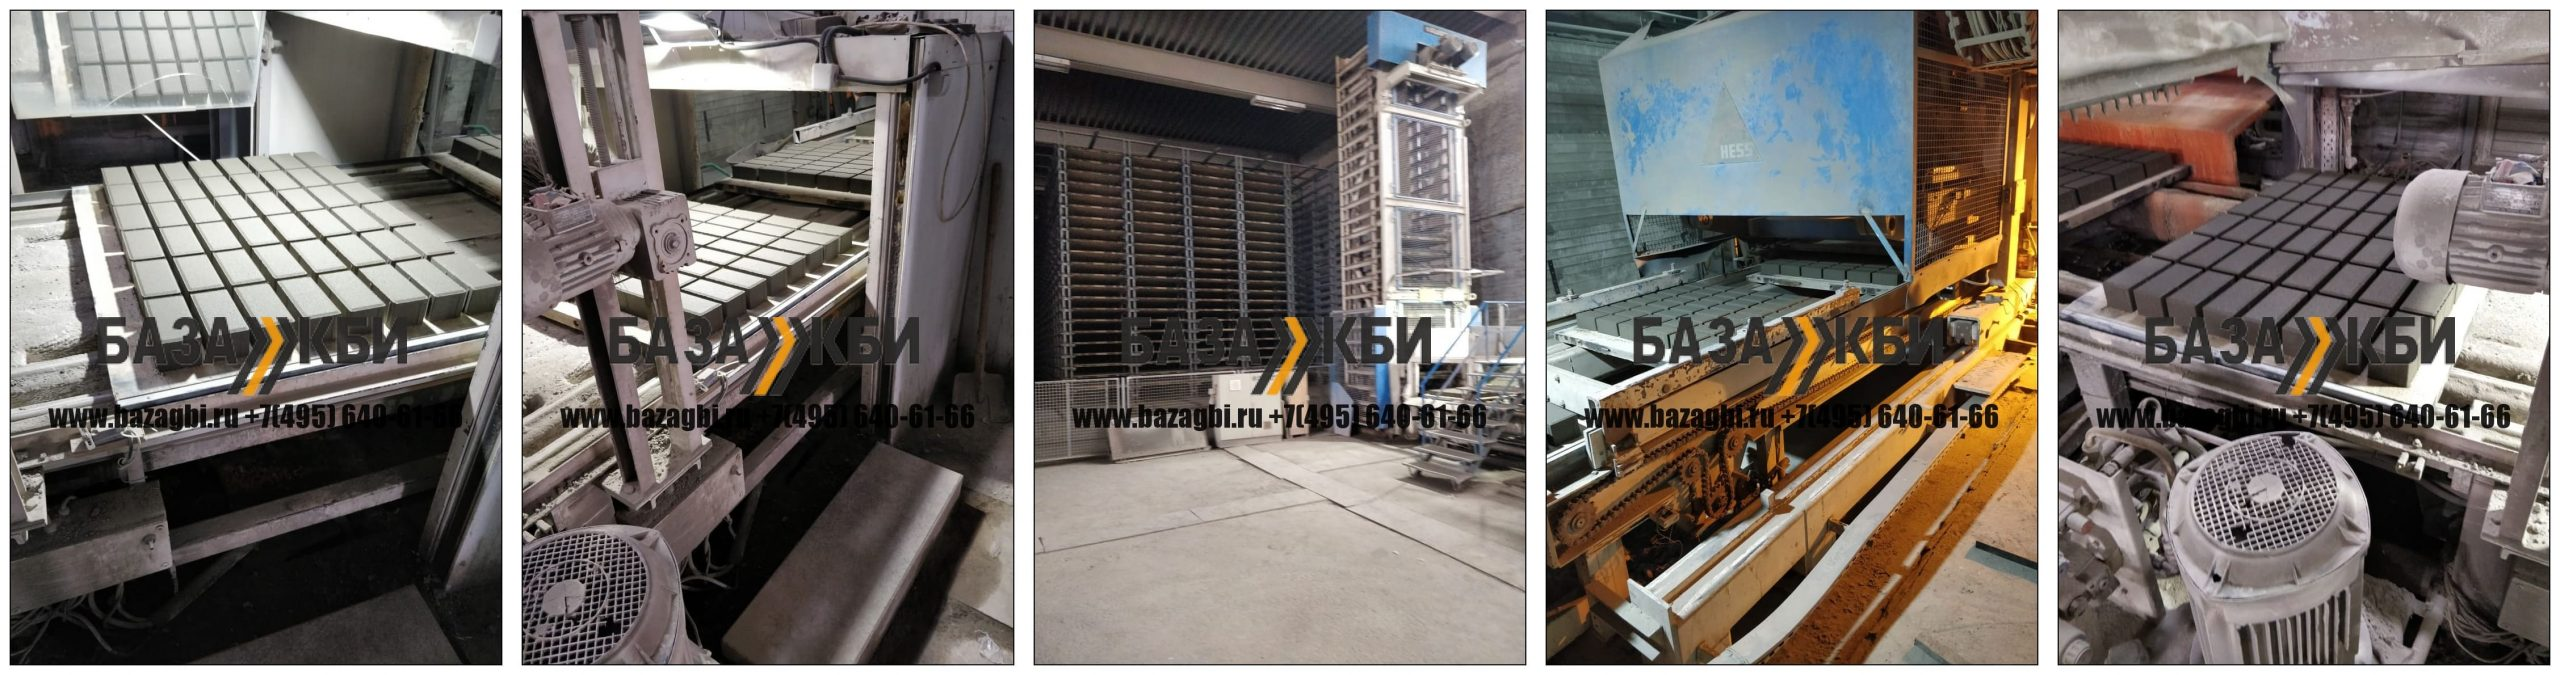 Производство тротуарной плитки База ЖБИ